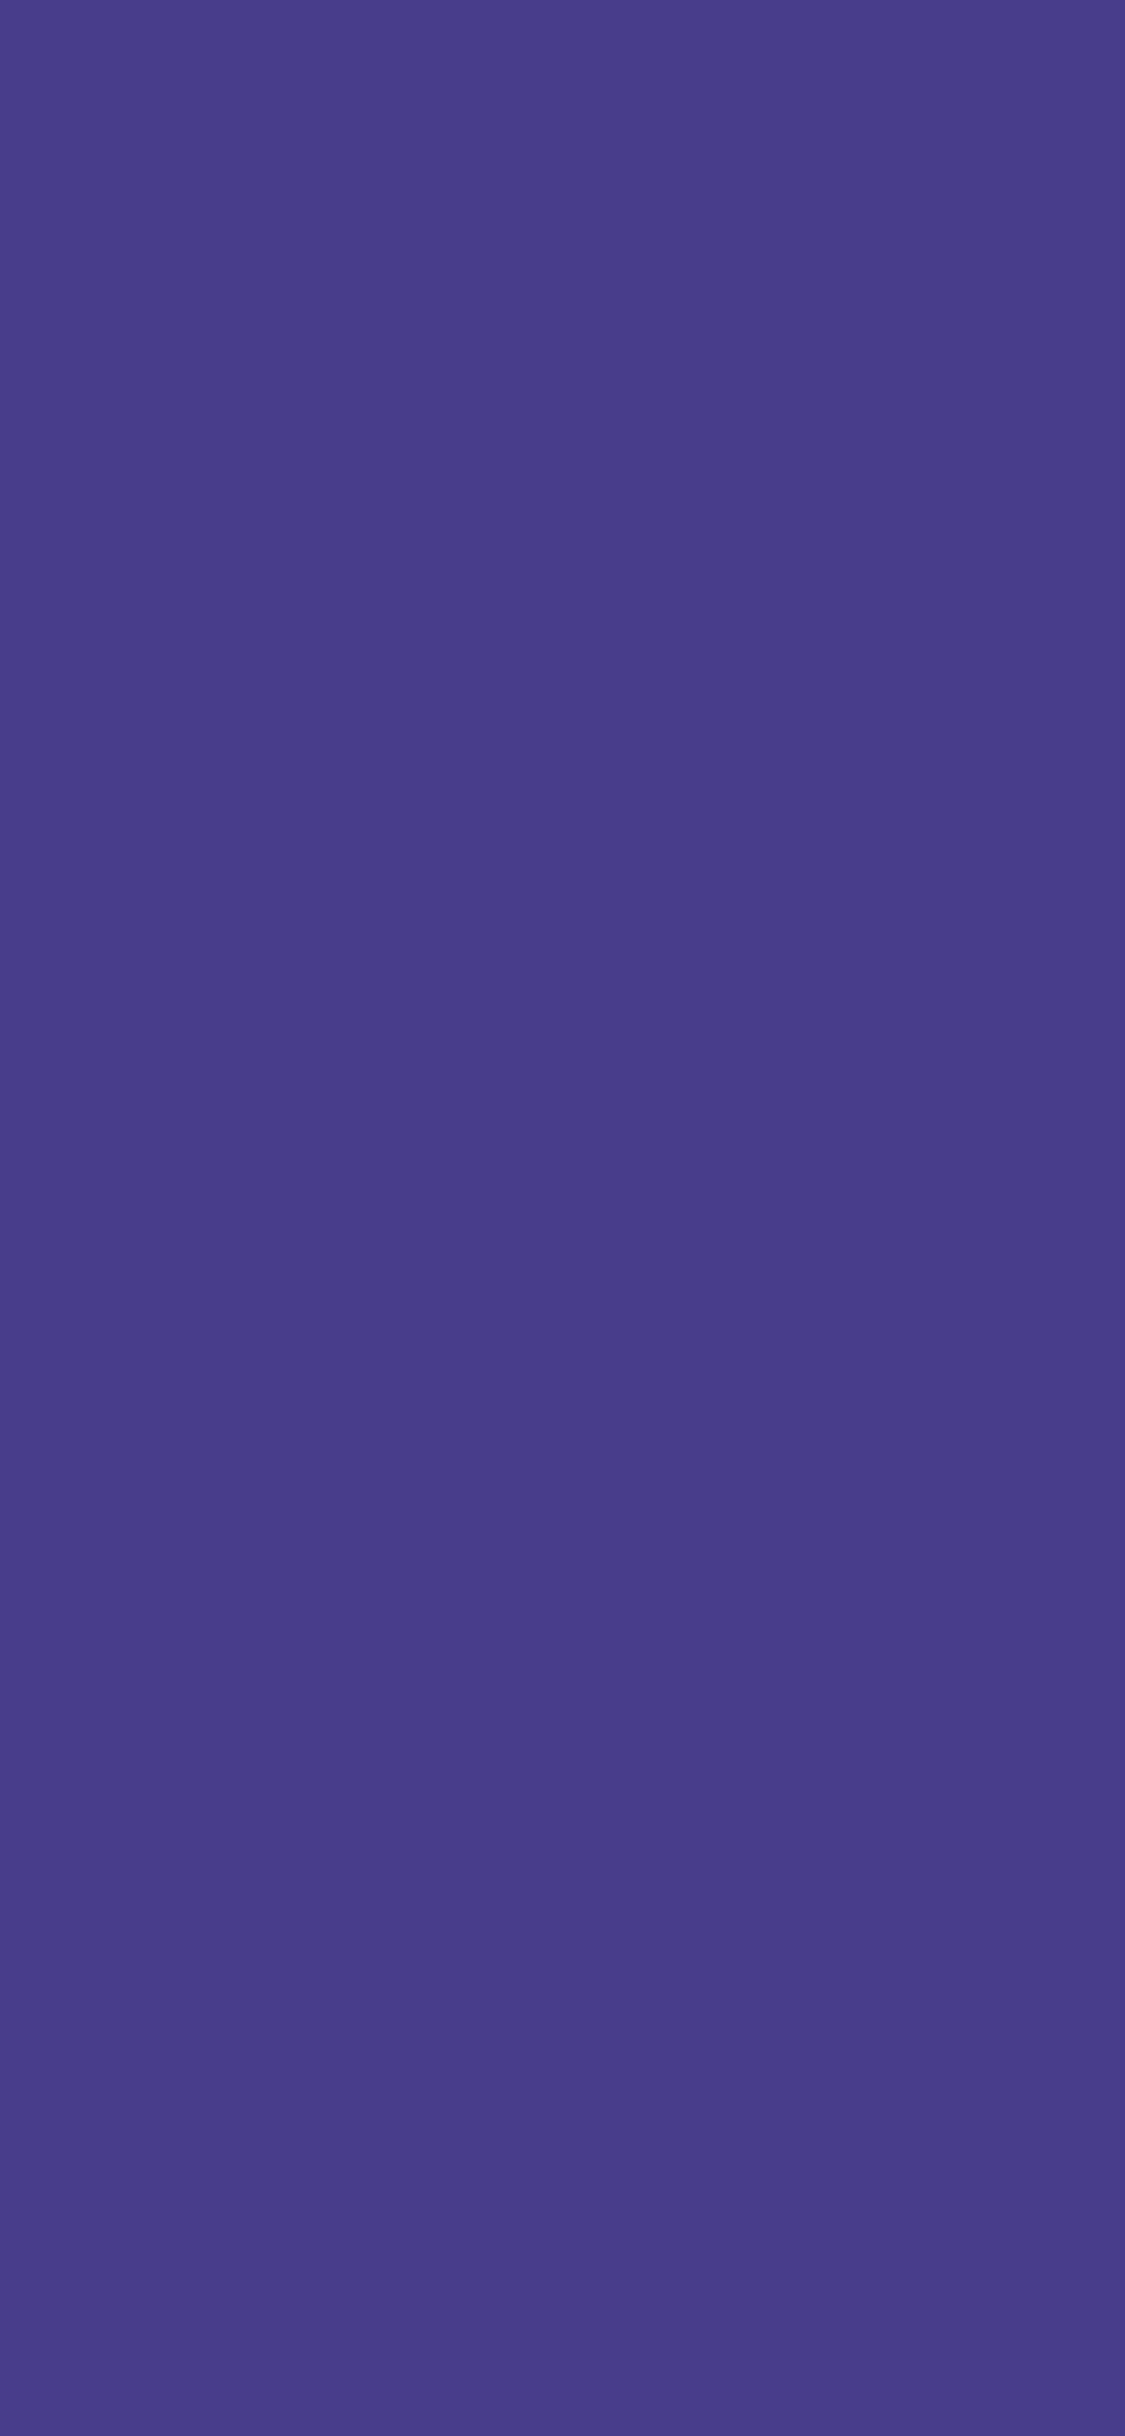 1125x2436 Dark Slate Blue Solid Color Background